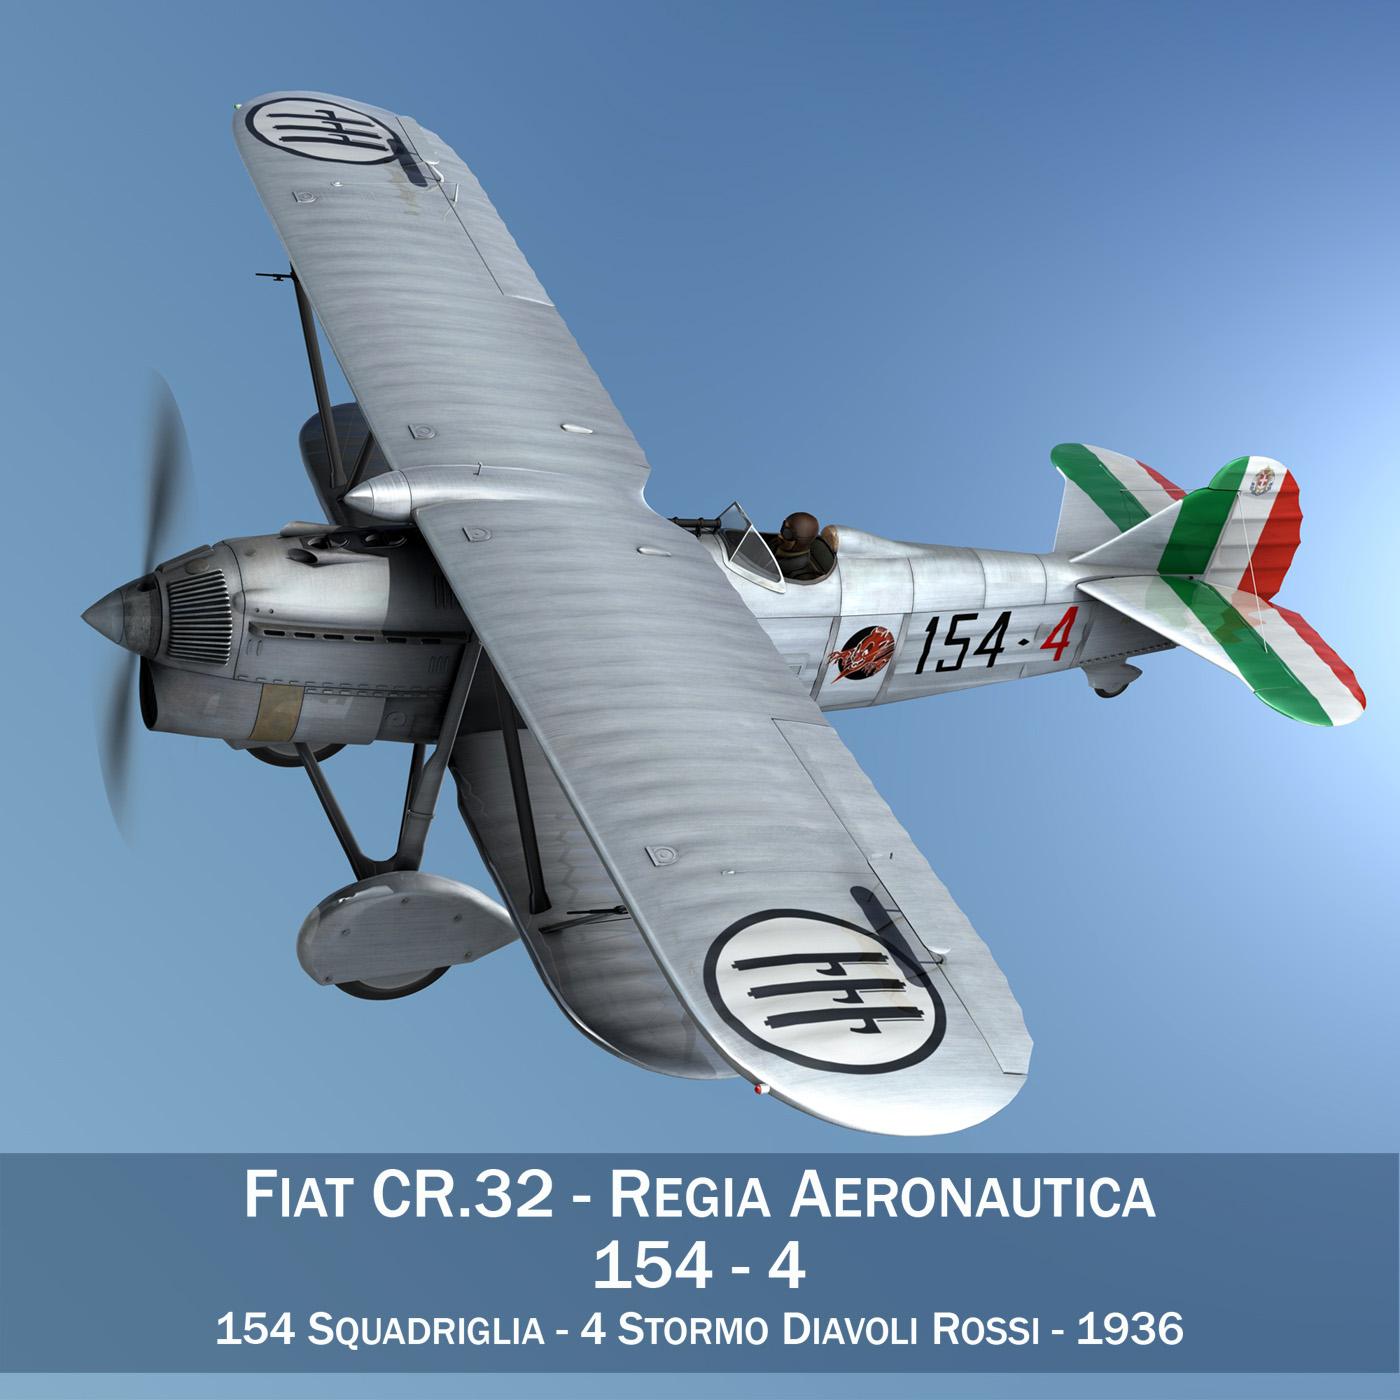 fiat cr.32 - Италийн агаарын хүчний - 154 к squadriglia 3d загвар fbx c4d lwo obj 268128